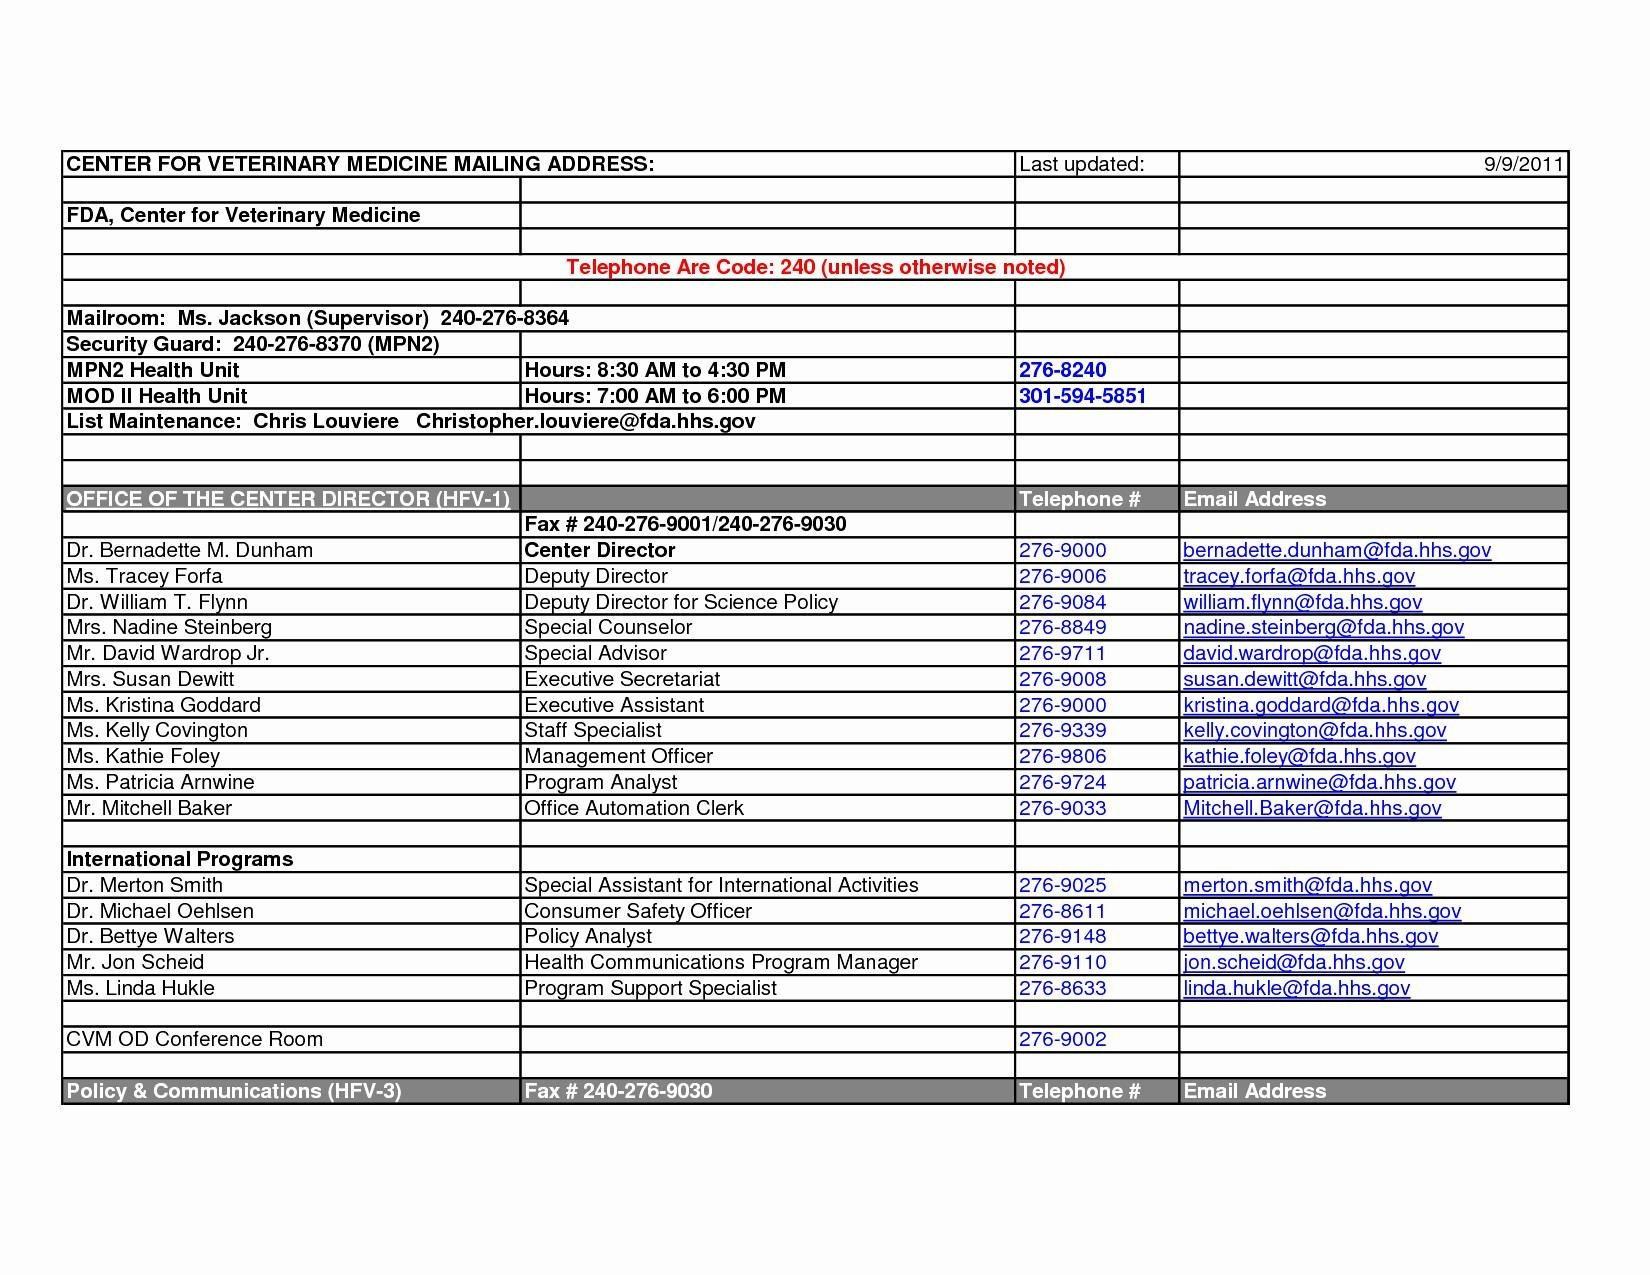 Nursing Budget Spreadsheet Inside Nursing Budget Spreadsheet – Budget Xls Kubreeuforicco  46 More